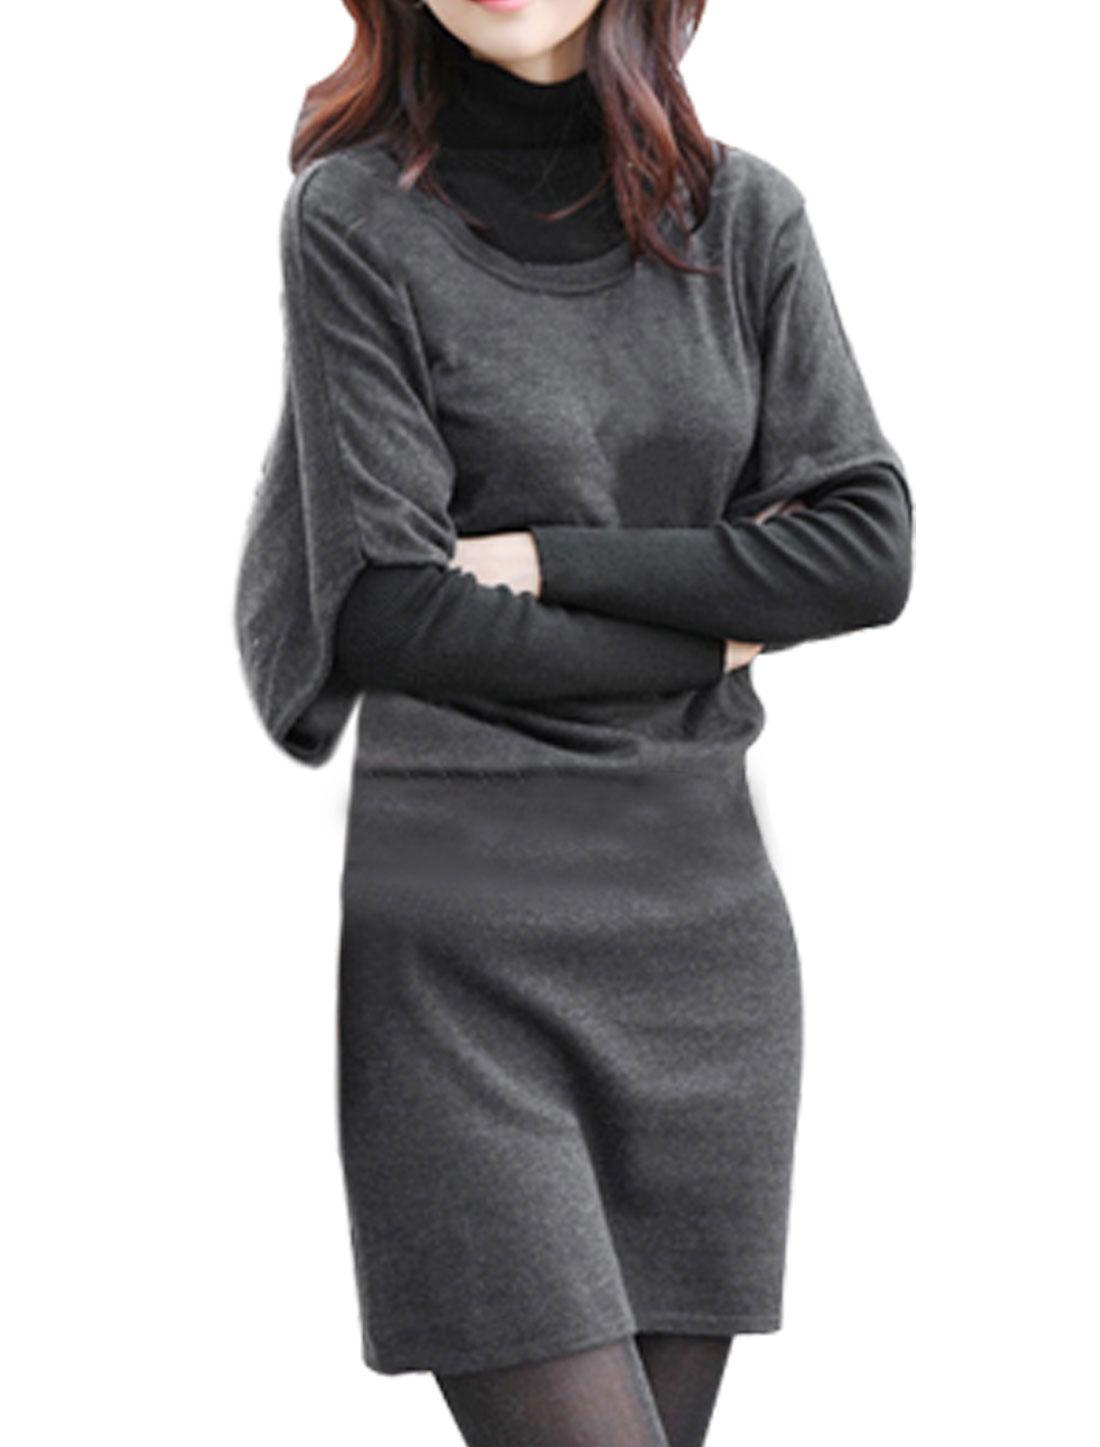 Ladies Dark Gray Bat-wing Sleeve Dress w Black Belt XS